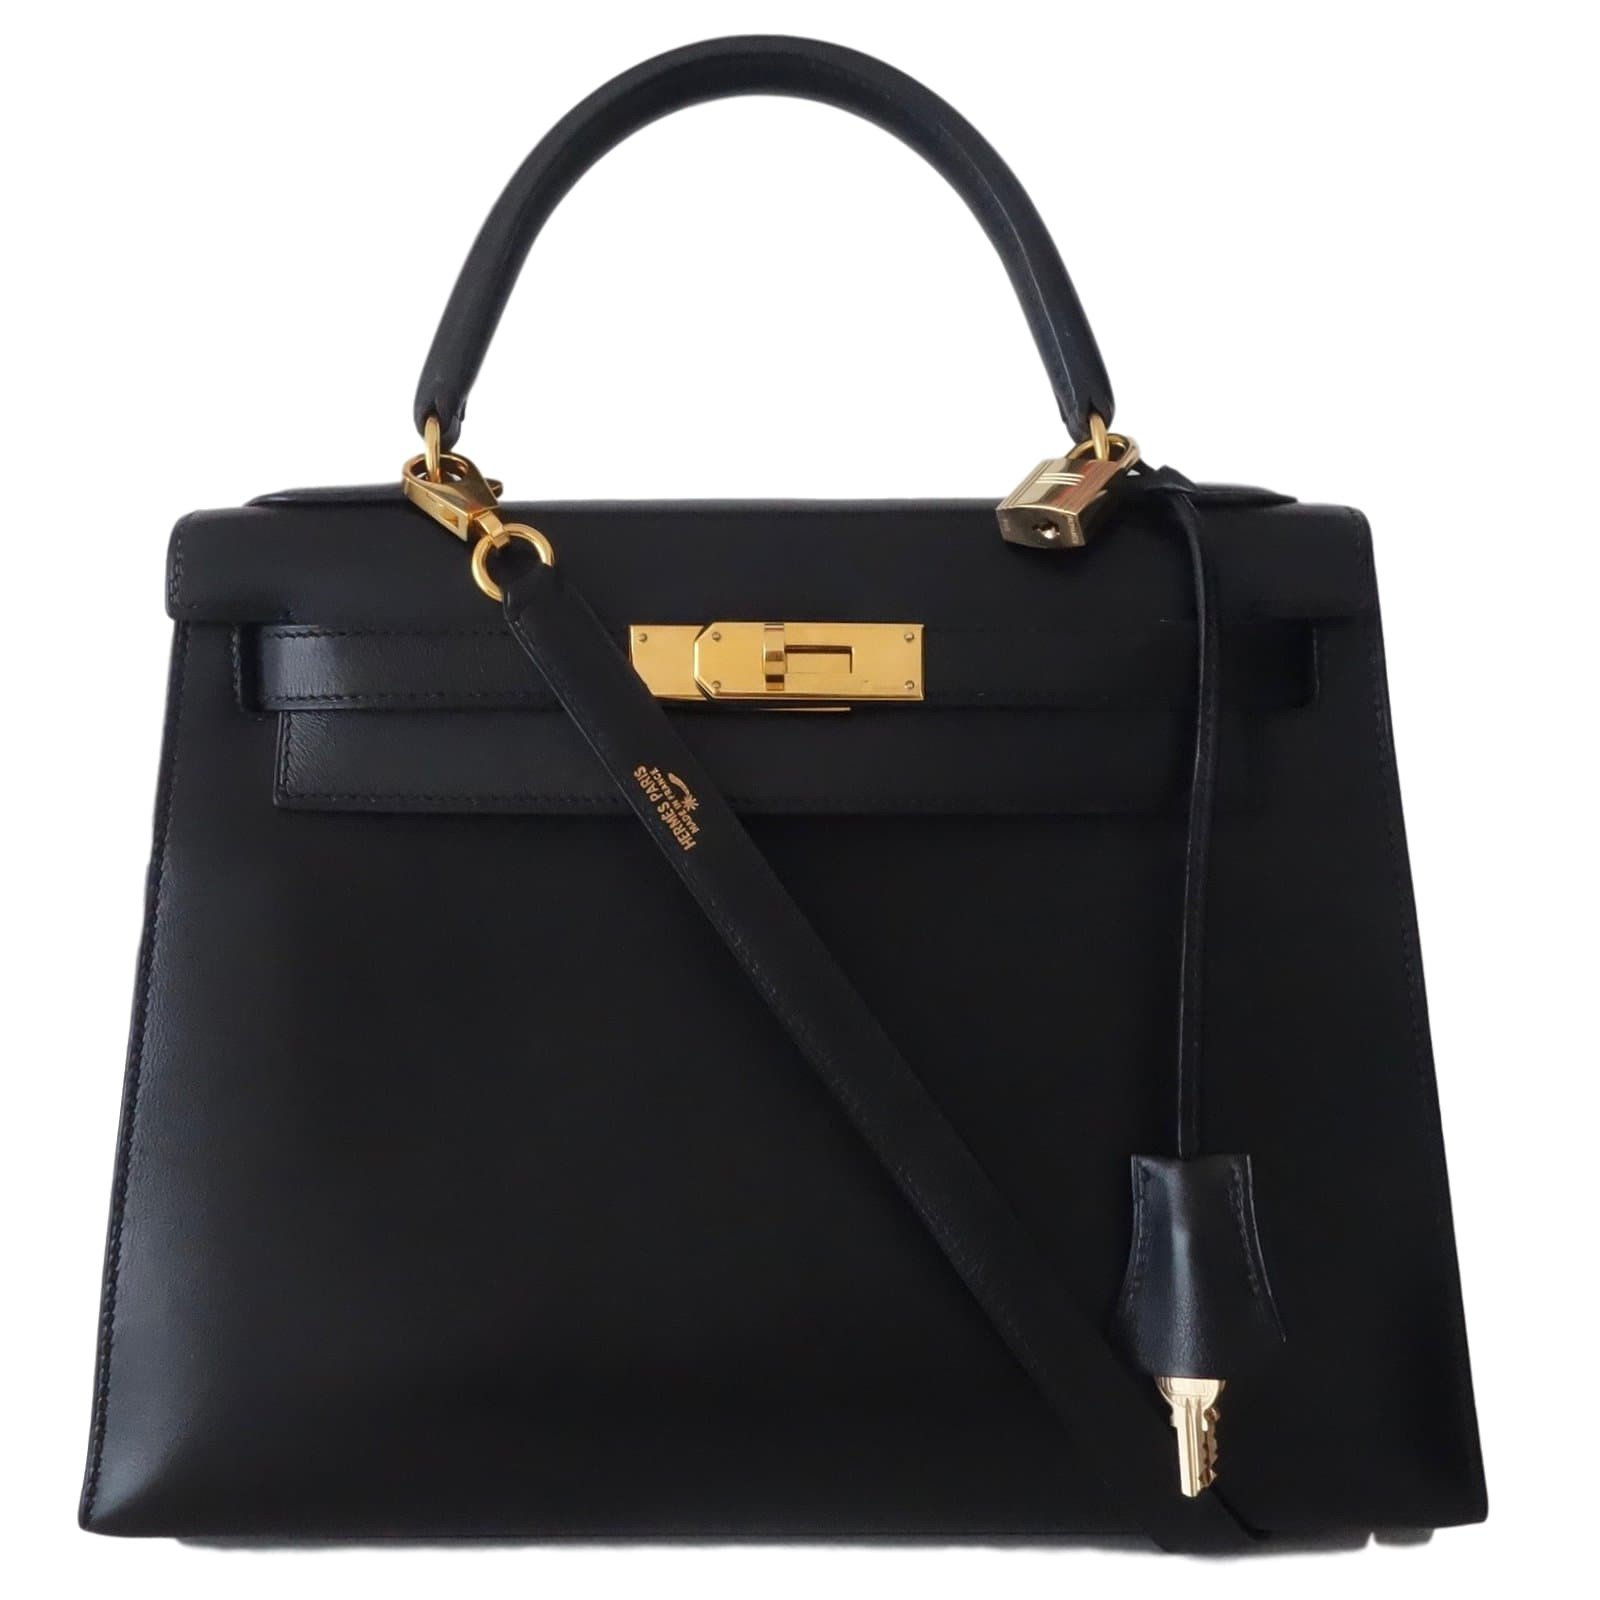 c3e955bc7c56 ... release date hermès kelly 28 handbags leather black ref.43543 24c23  539ef